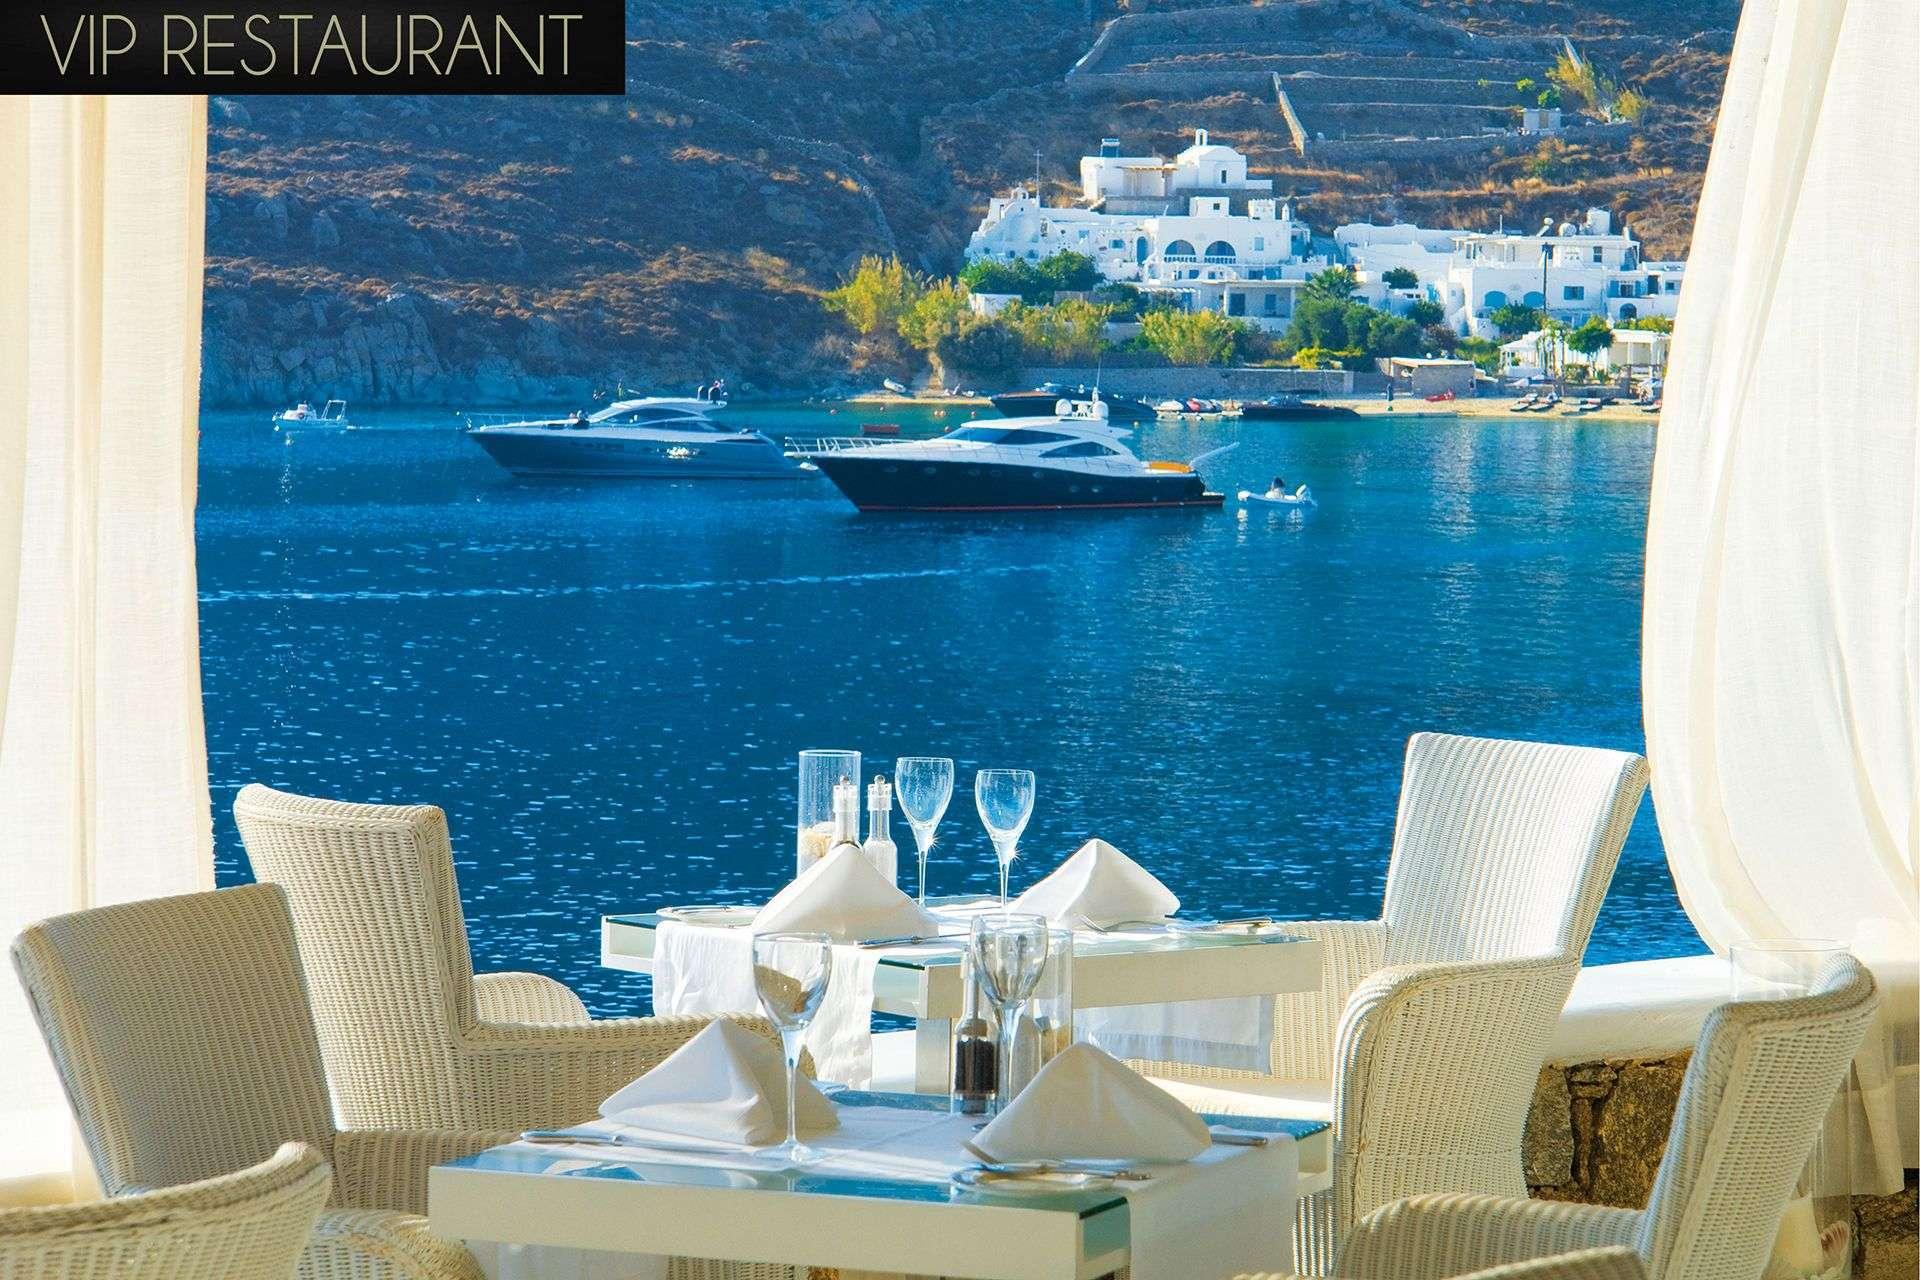 VIP Restaurant Mykonos Restaurants